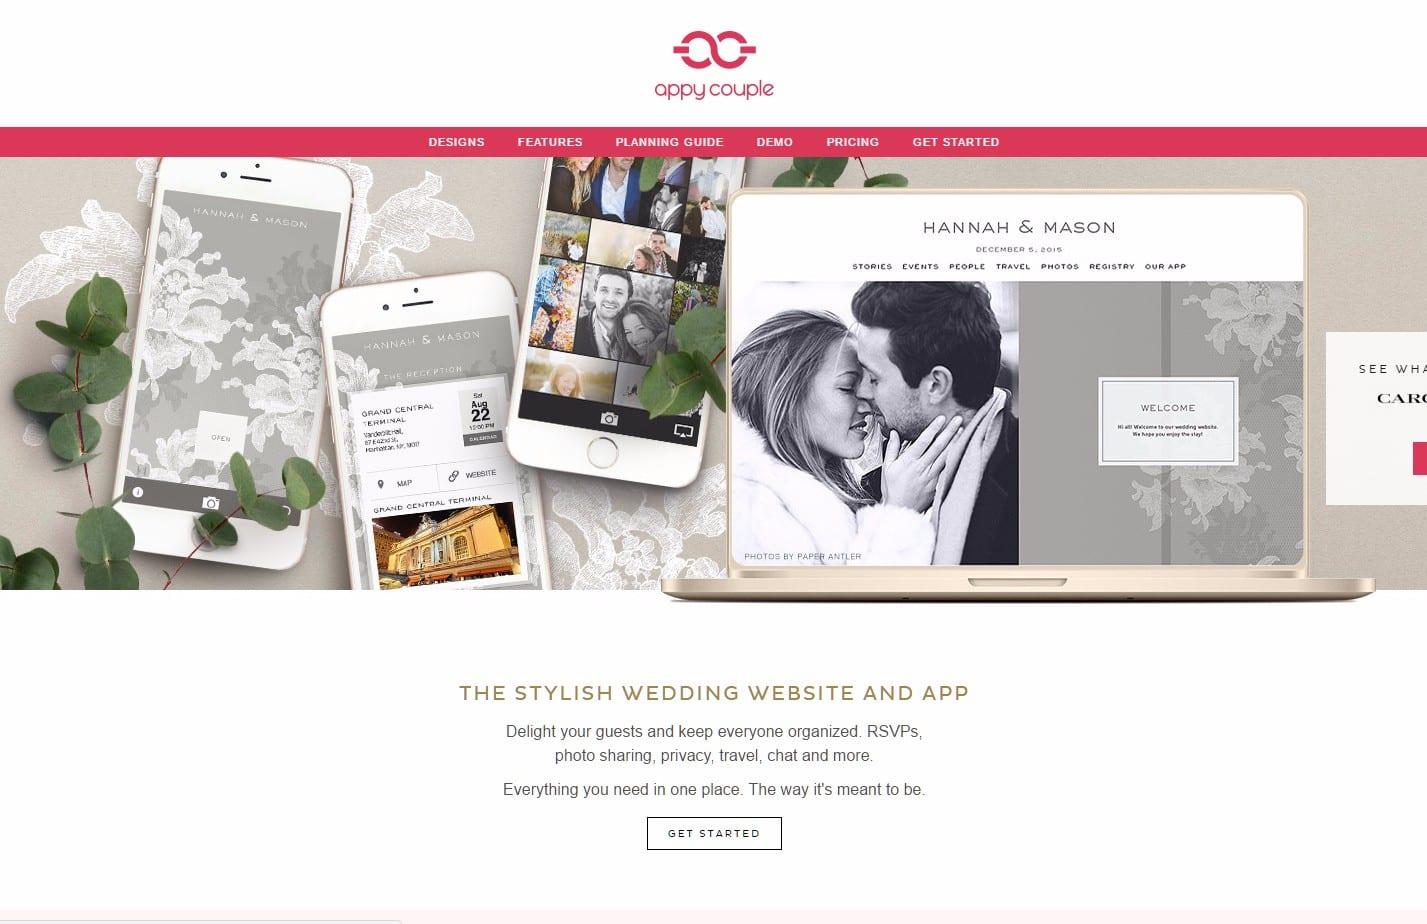 Appy Couple Wedding Website App That Delights Google Chrome 4282017 83420 PMbmp